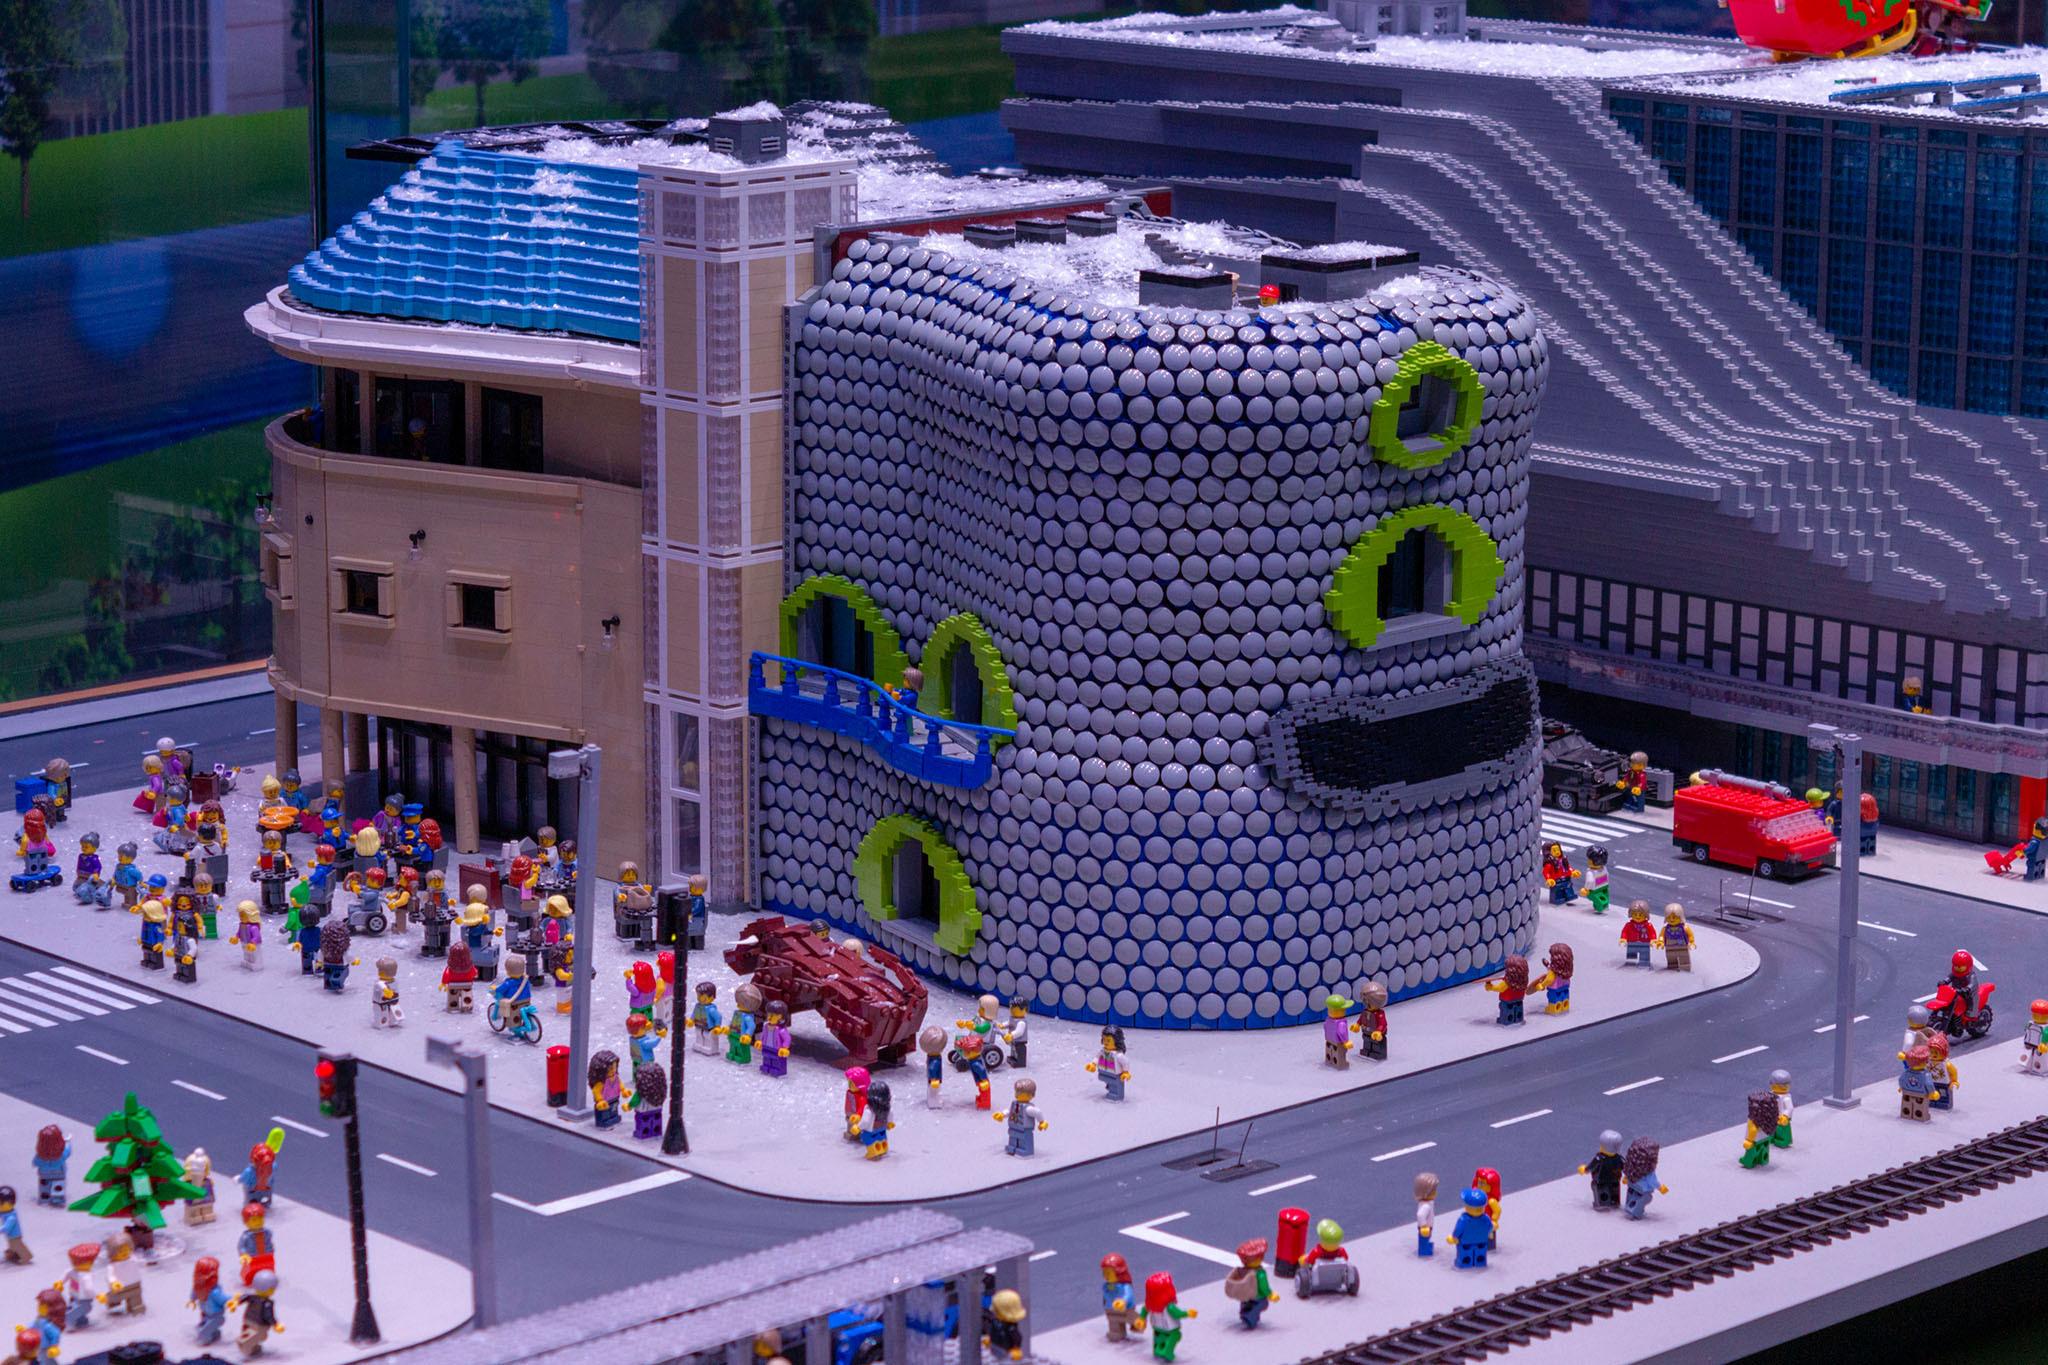 A lego building